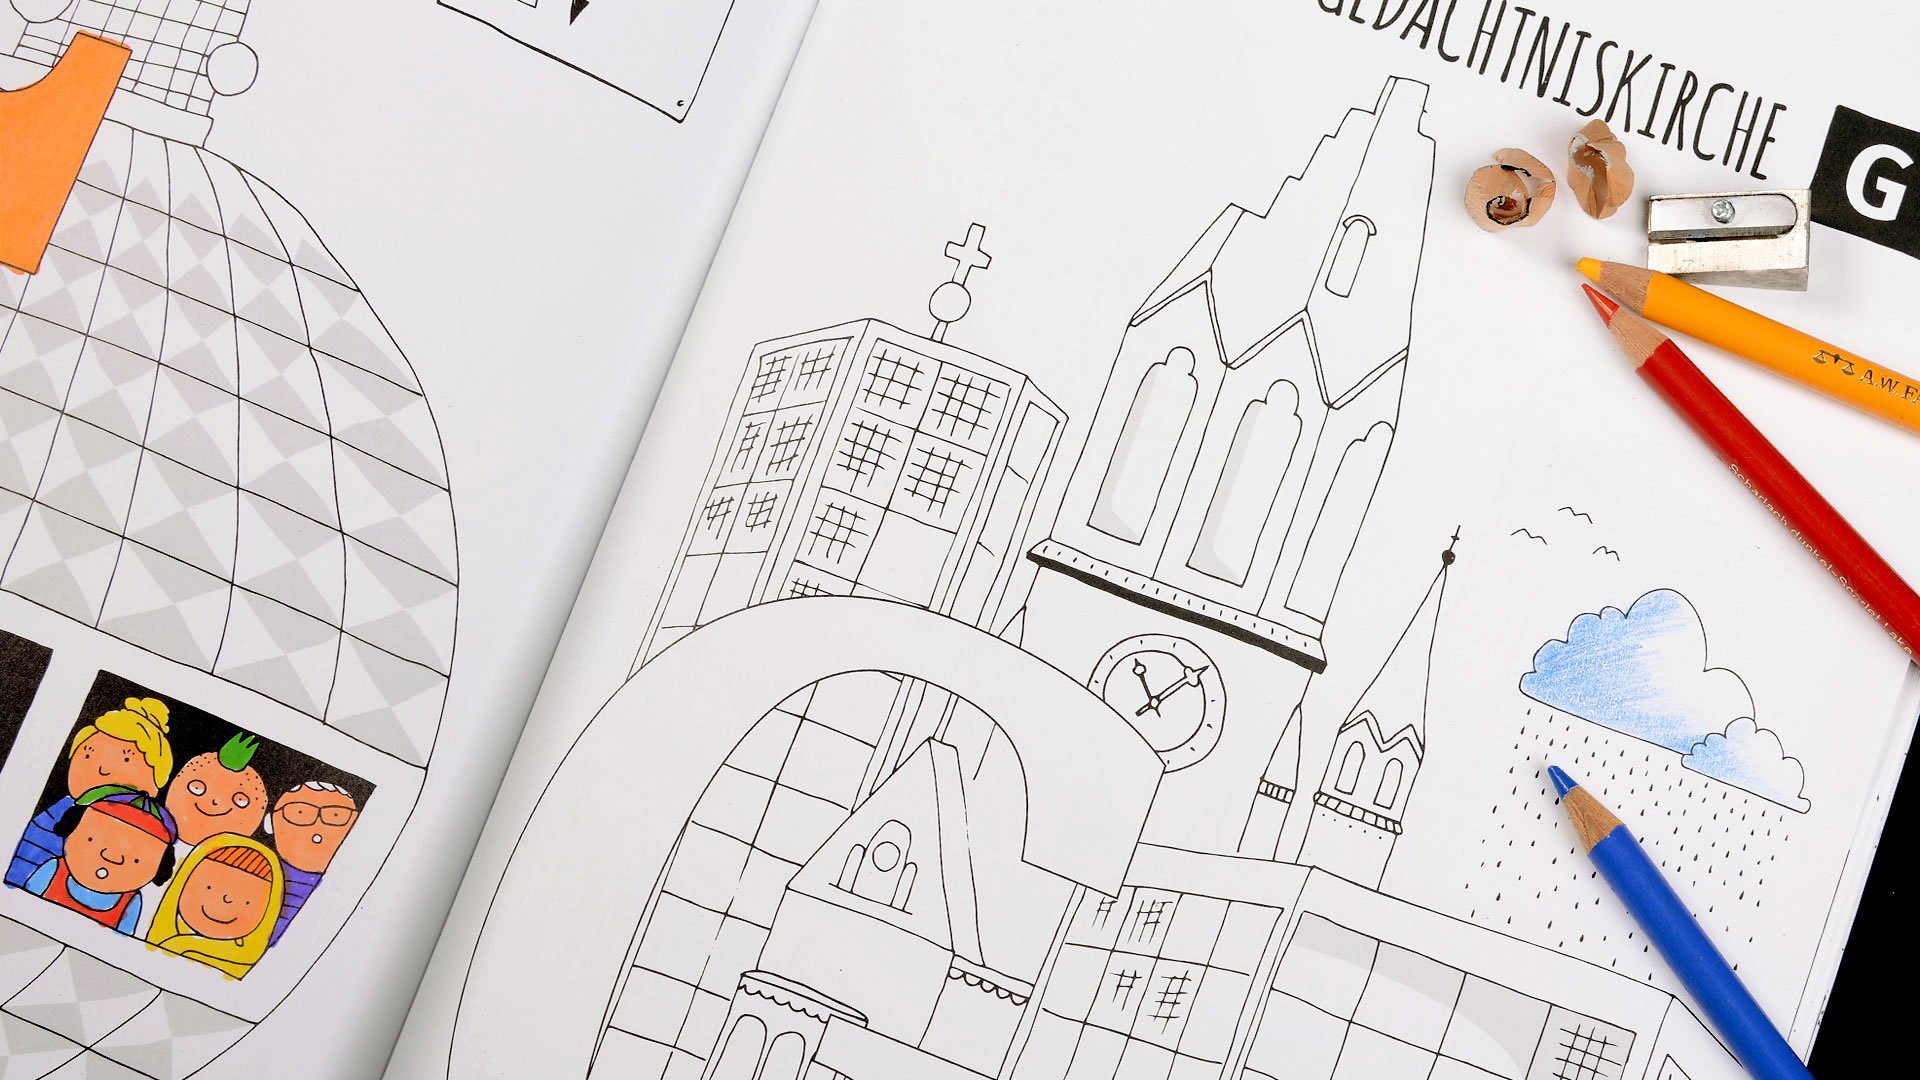 Berlin ABC Malbuch | Gedächniskirche zum Ausmalen